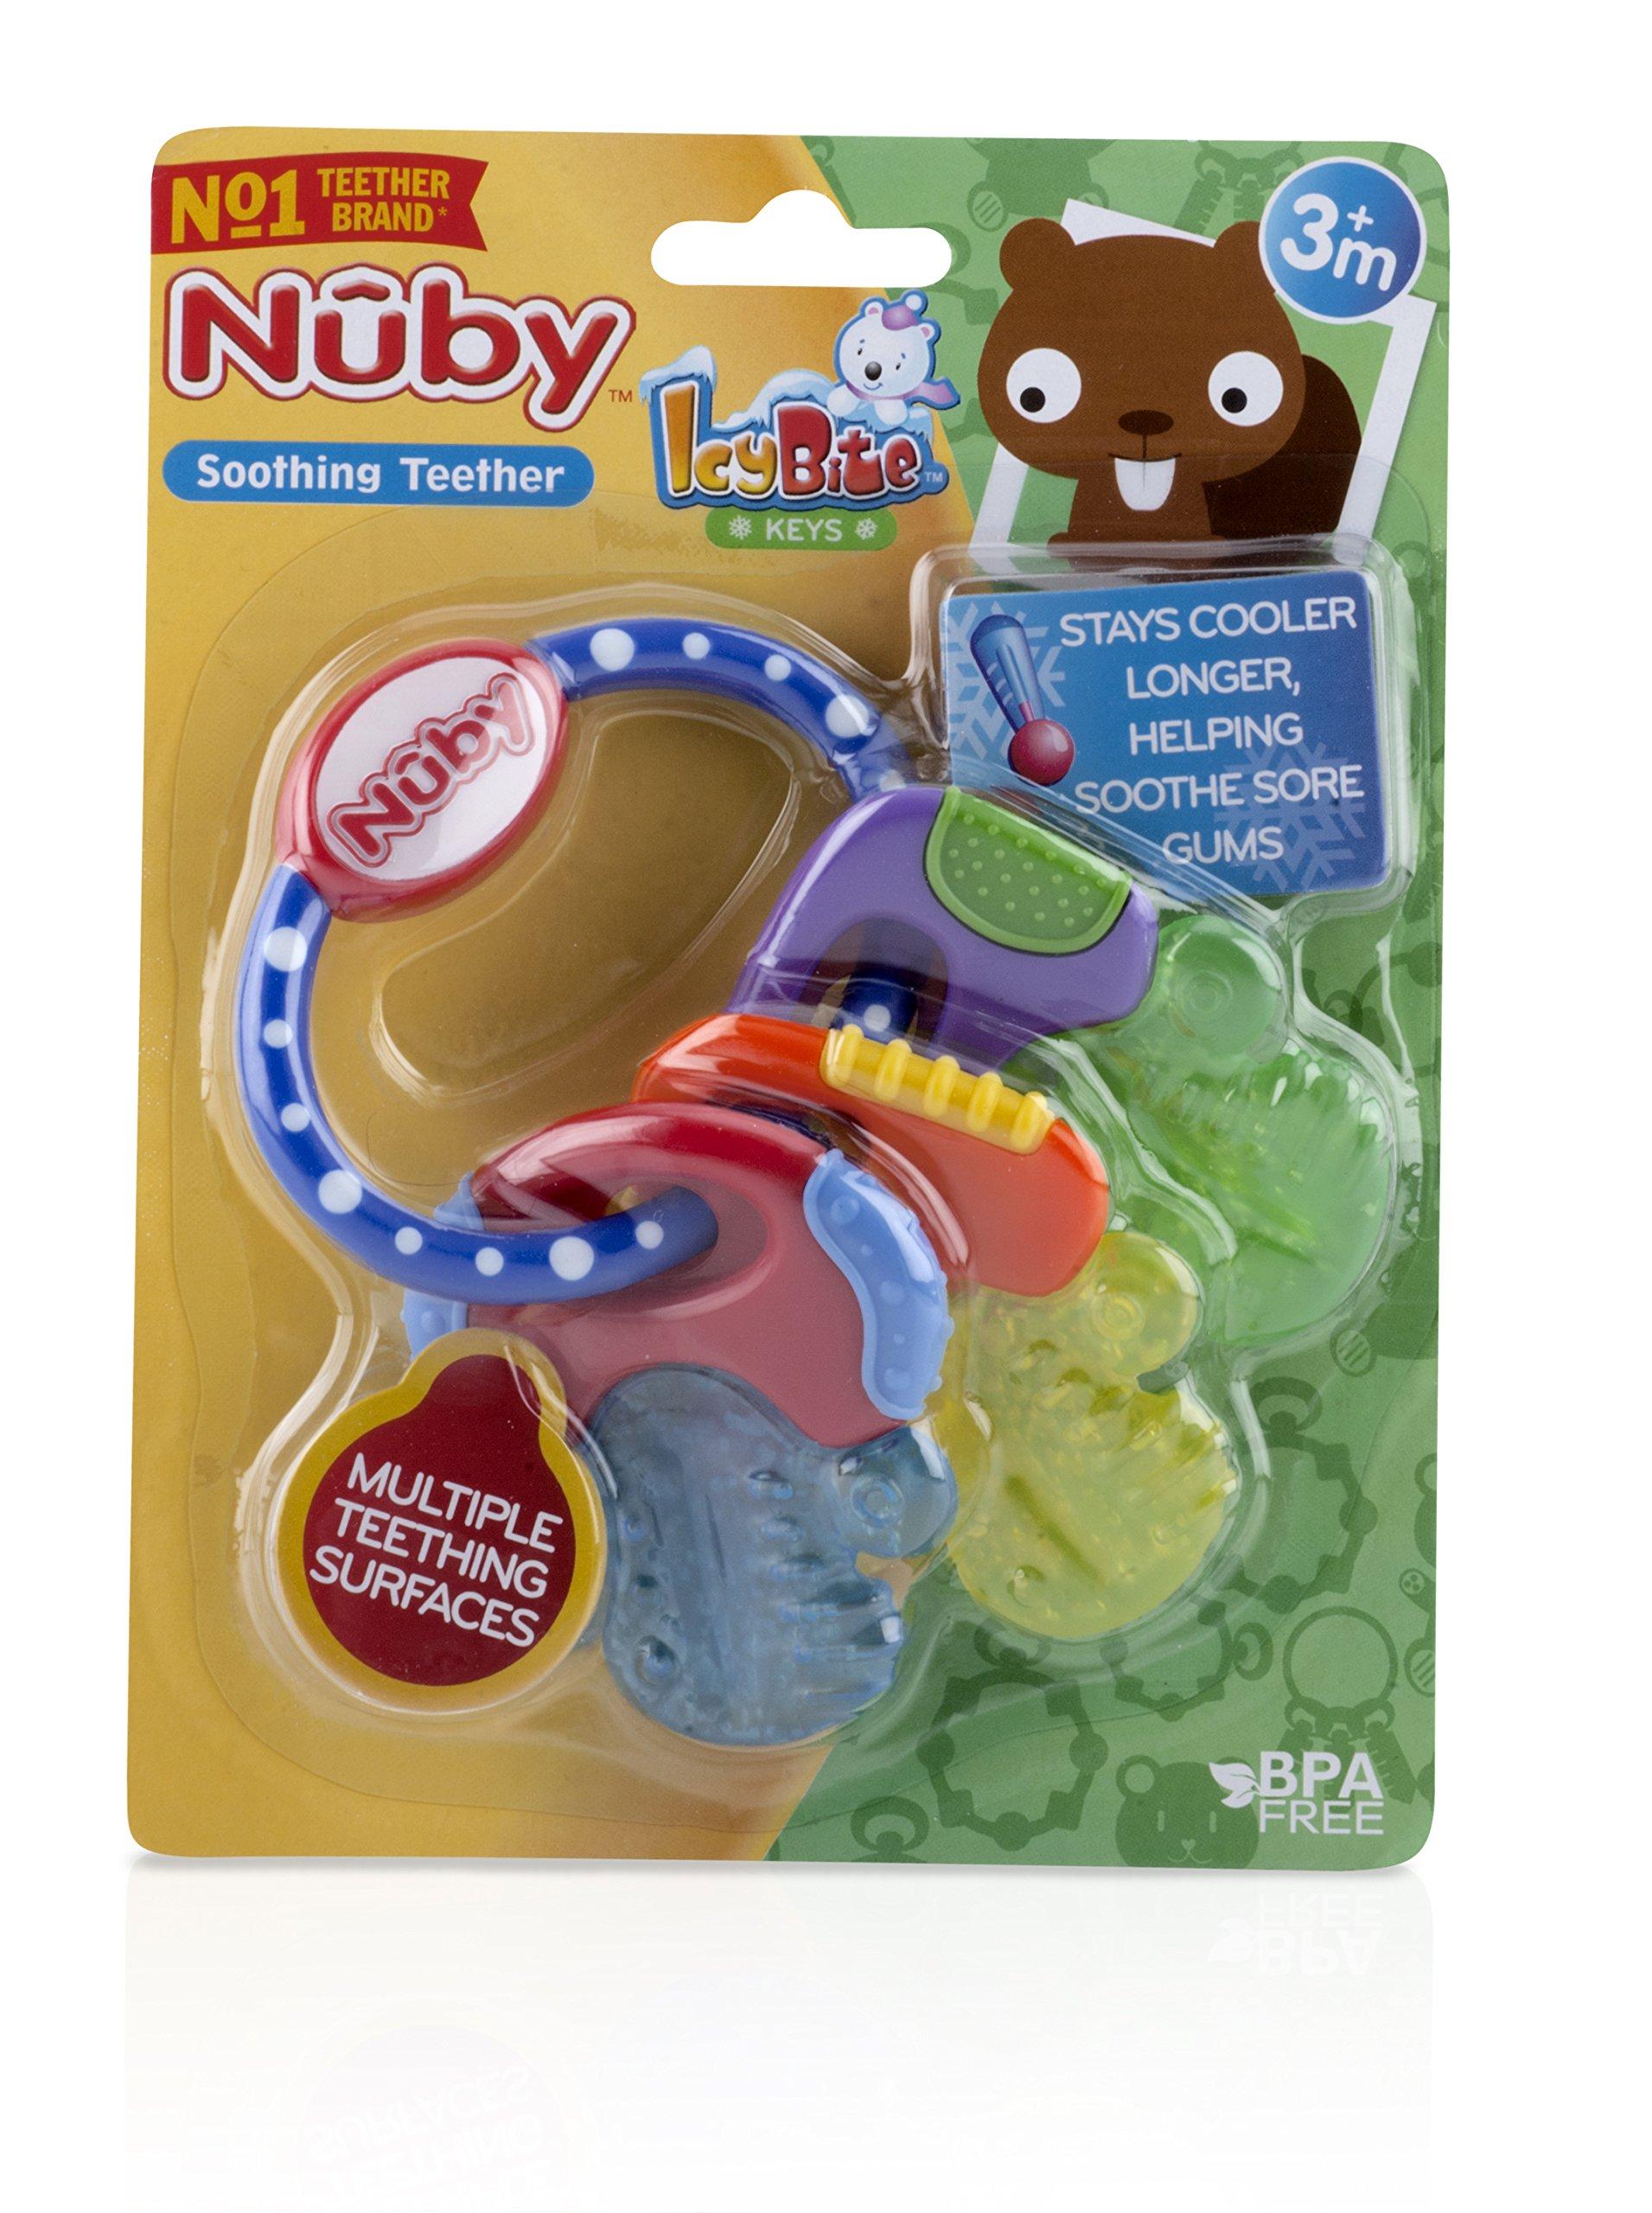 Nuby Icy Bite Keys Multi Surfaced Soothing Teether